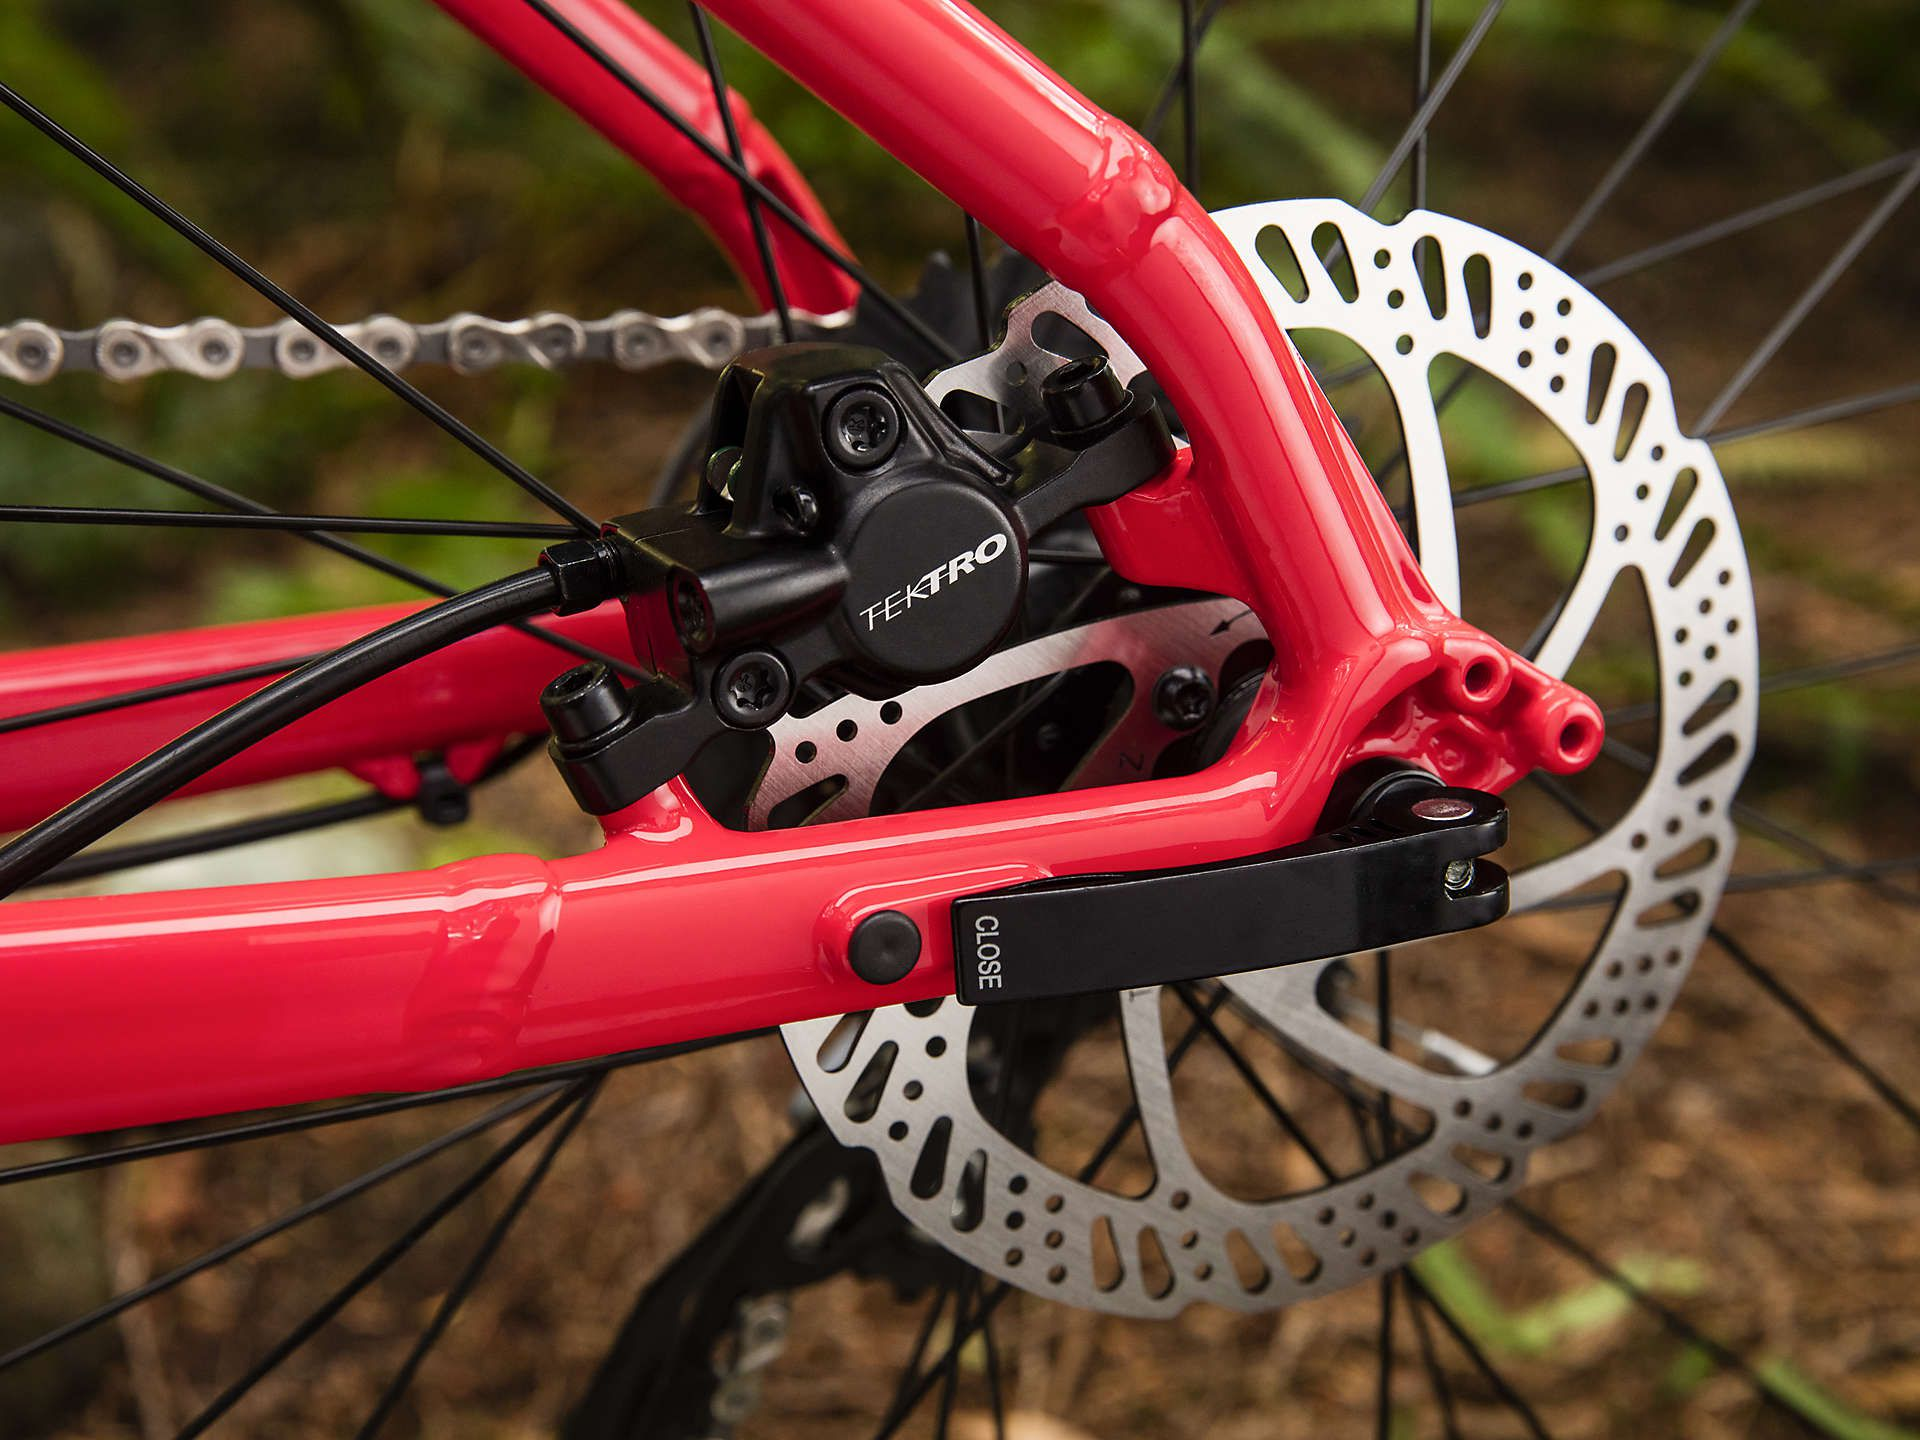 Bicicleta Trek Marlin 7 Feminina - R$ 4.499,00